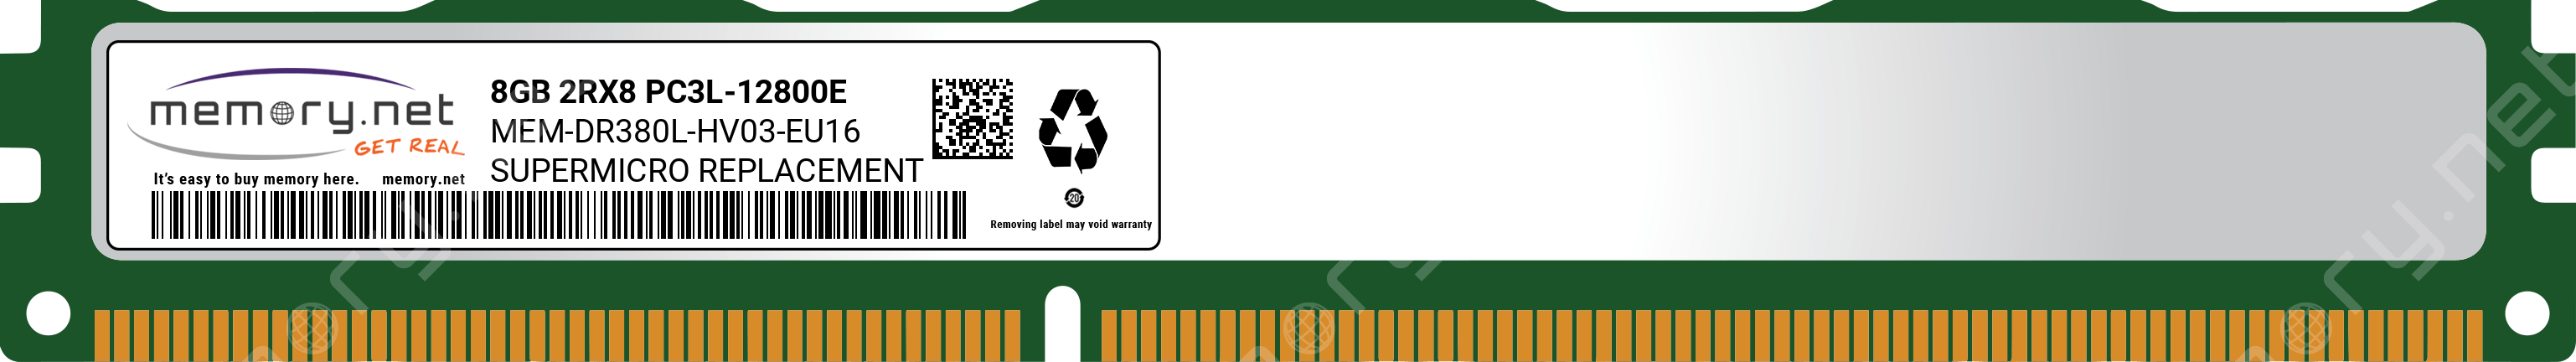 MEM-DR380L-HV03-EU16